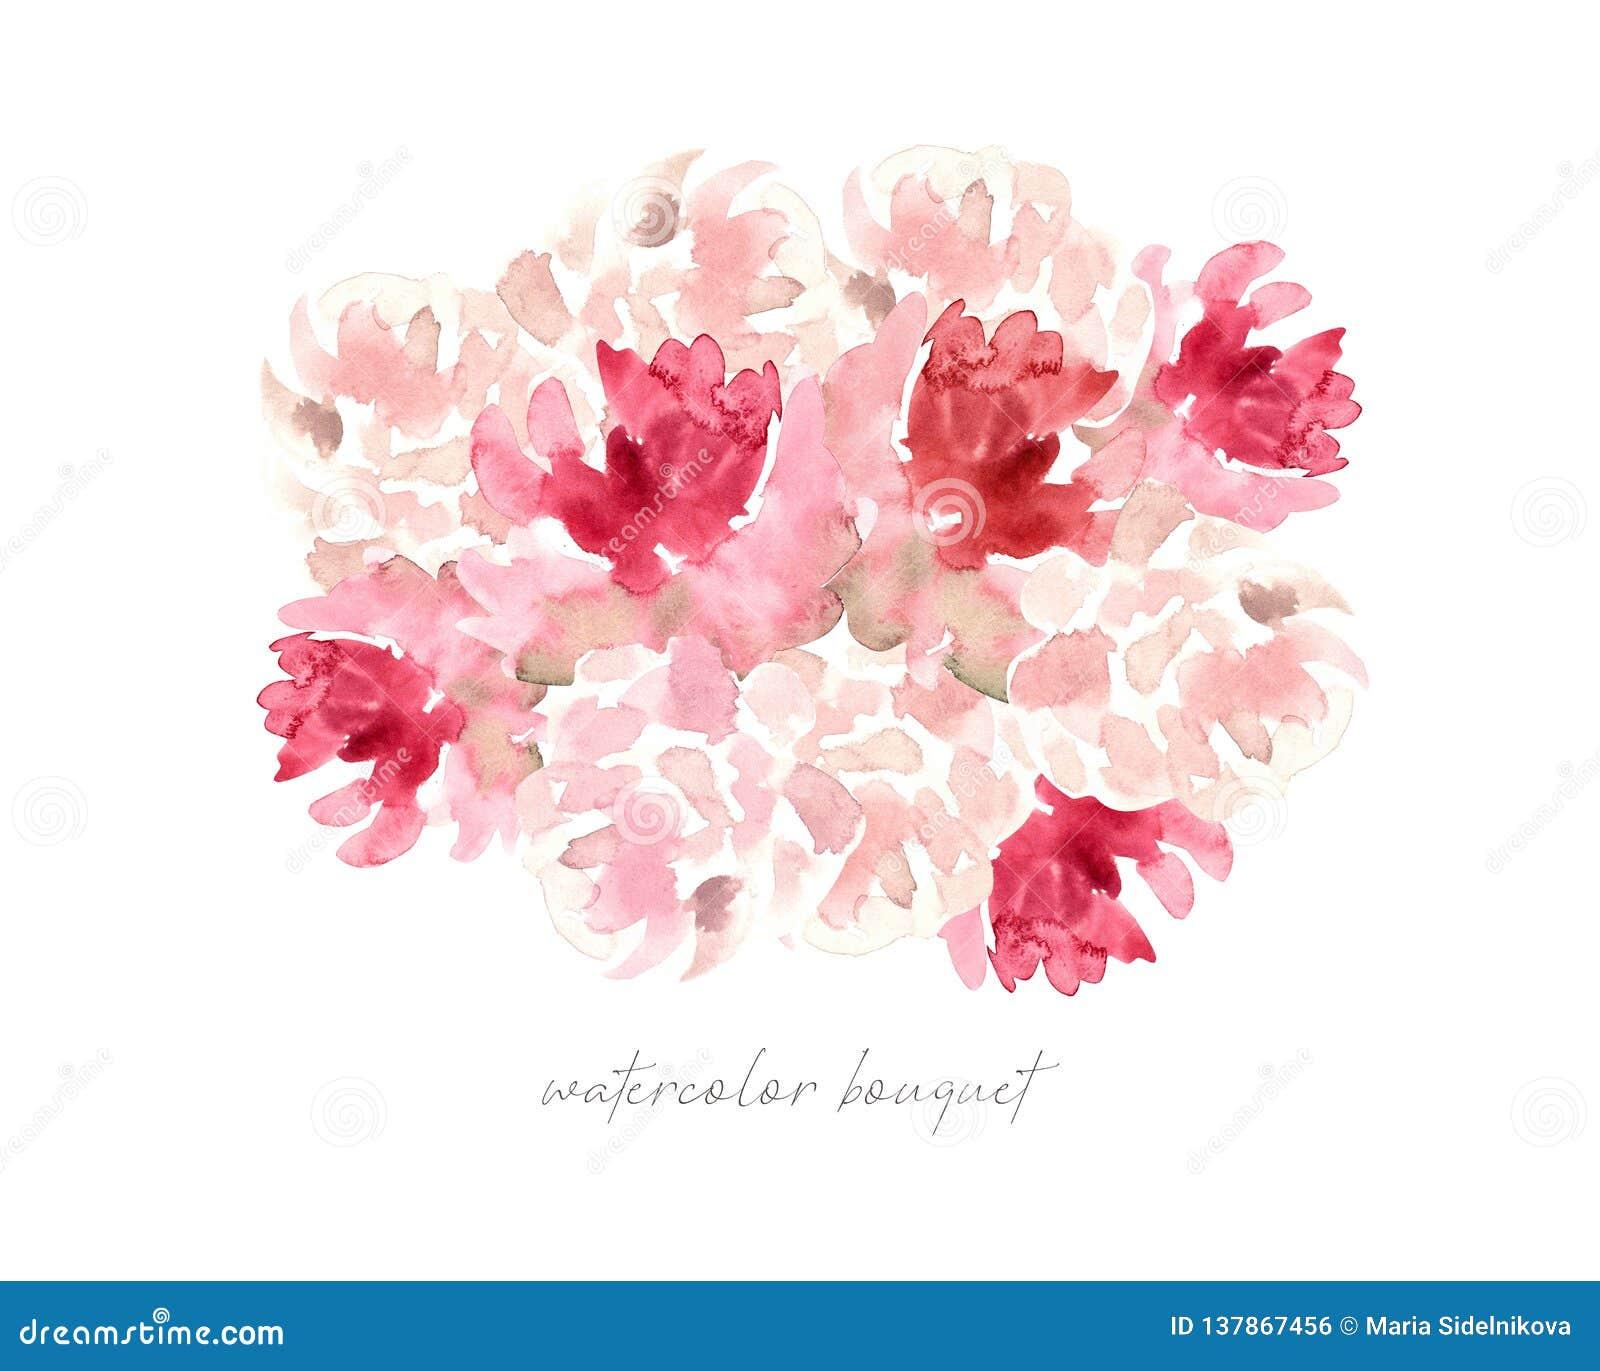 Akwareli backgrounde różowe róże i peonia bukiet, kwitnie